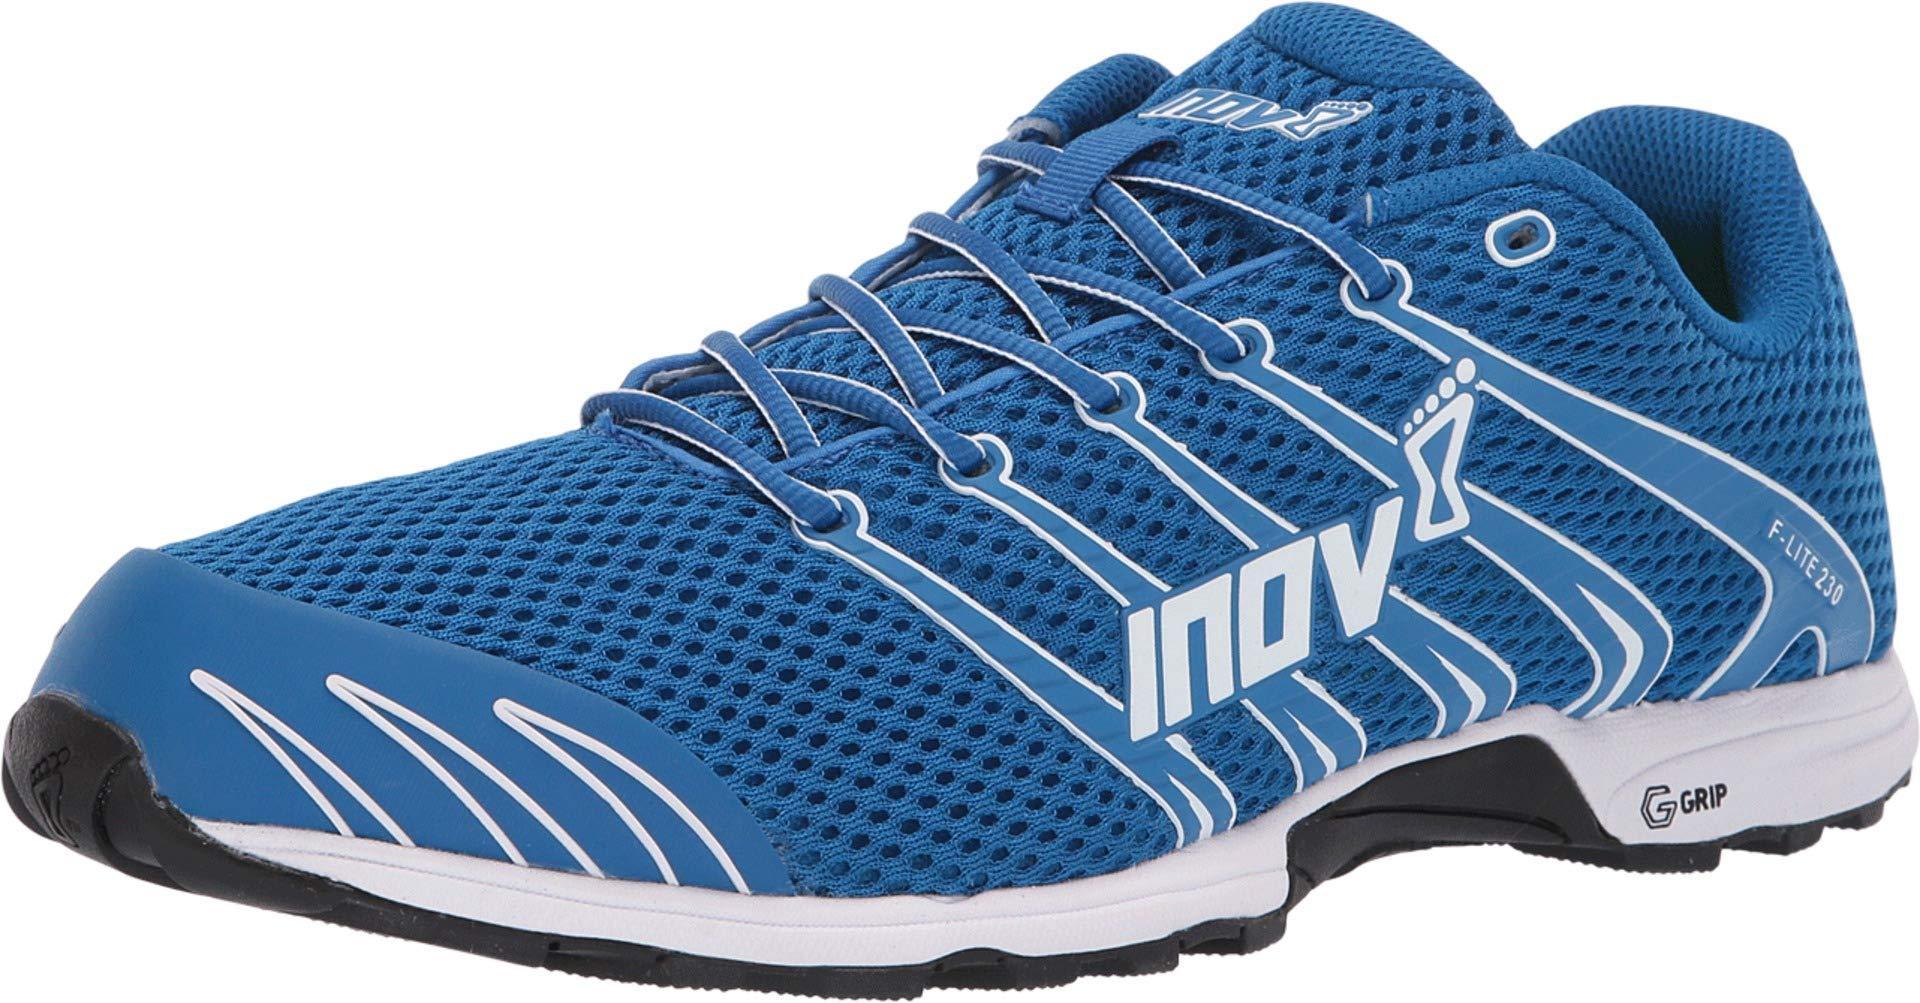 Inov-8 Women's Roclite G 275 Lightweight Terrain Running Shoes